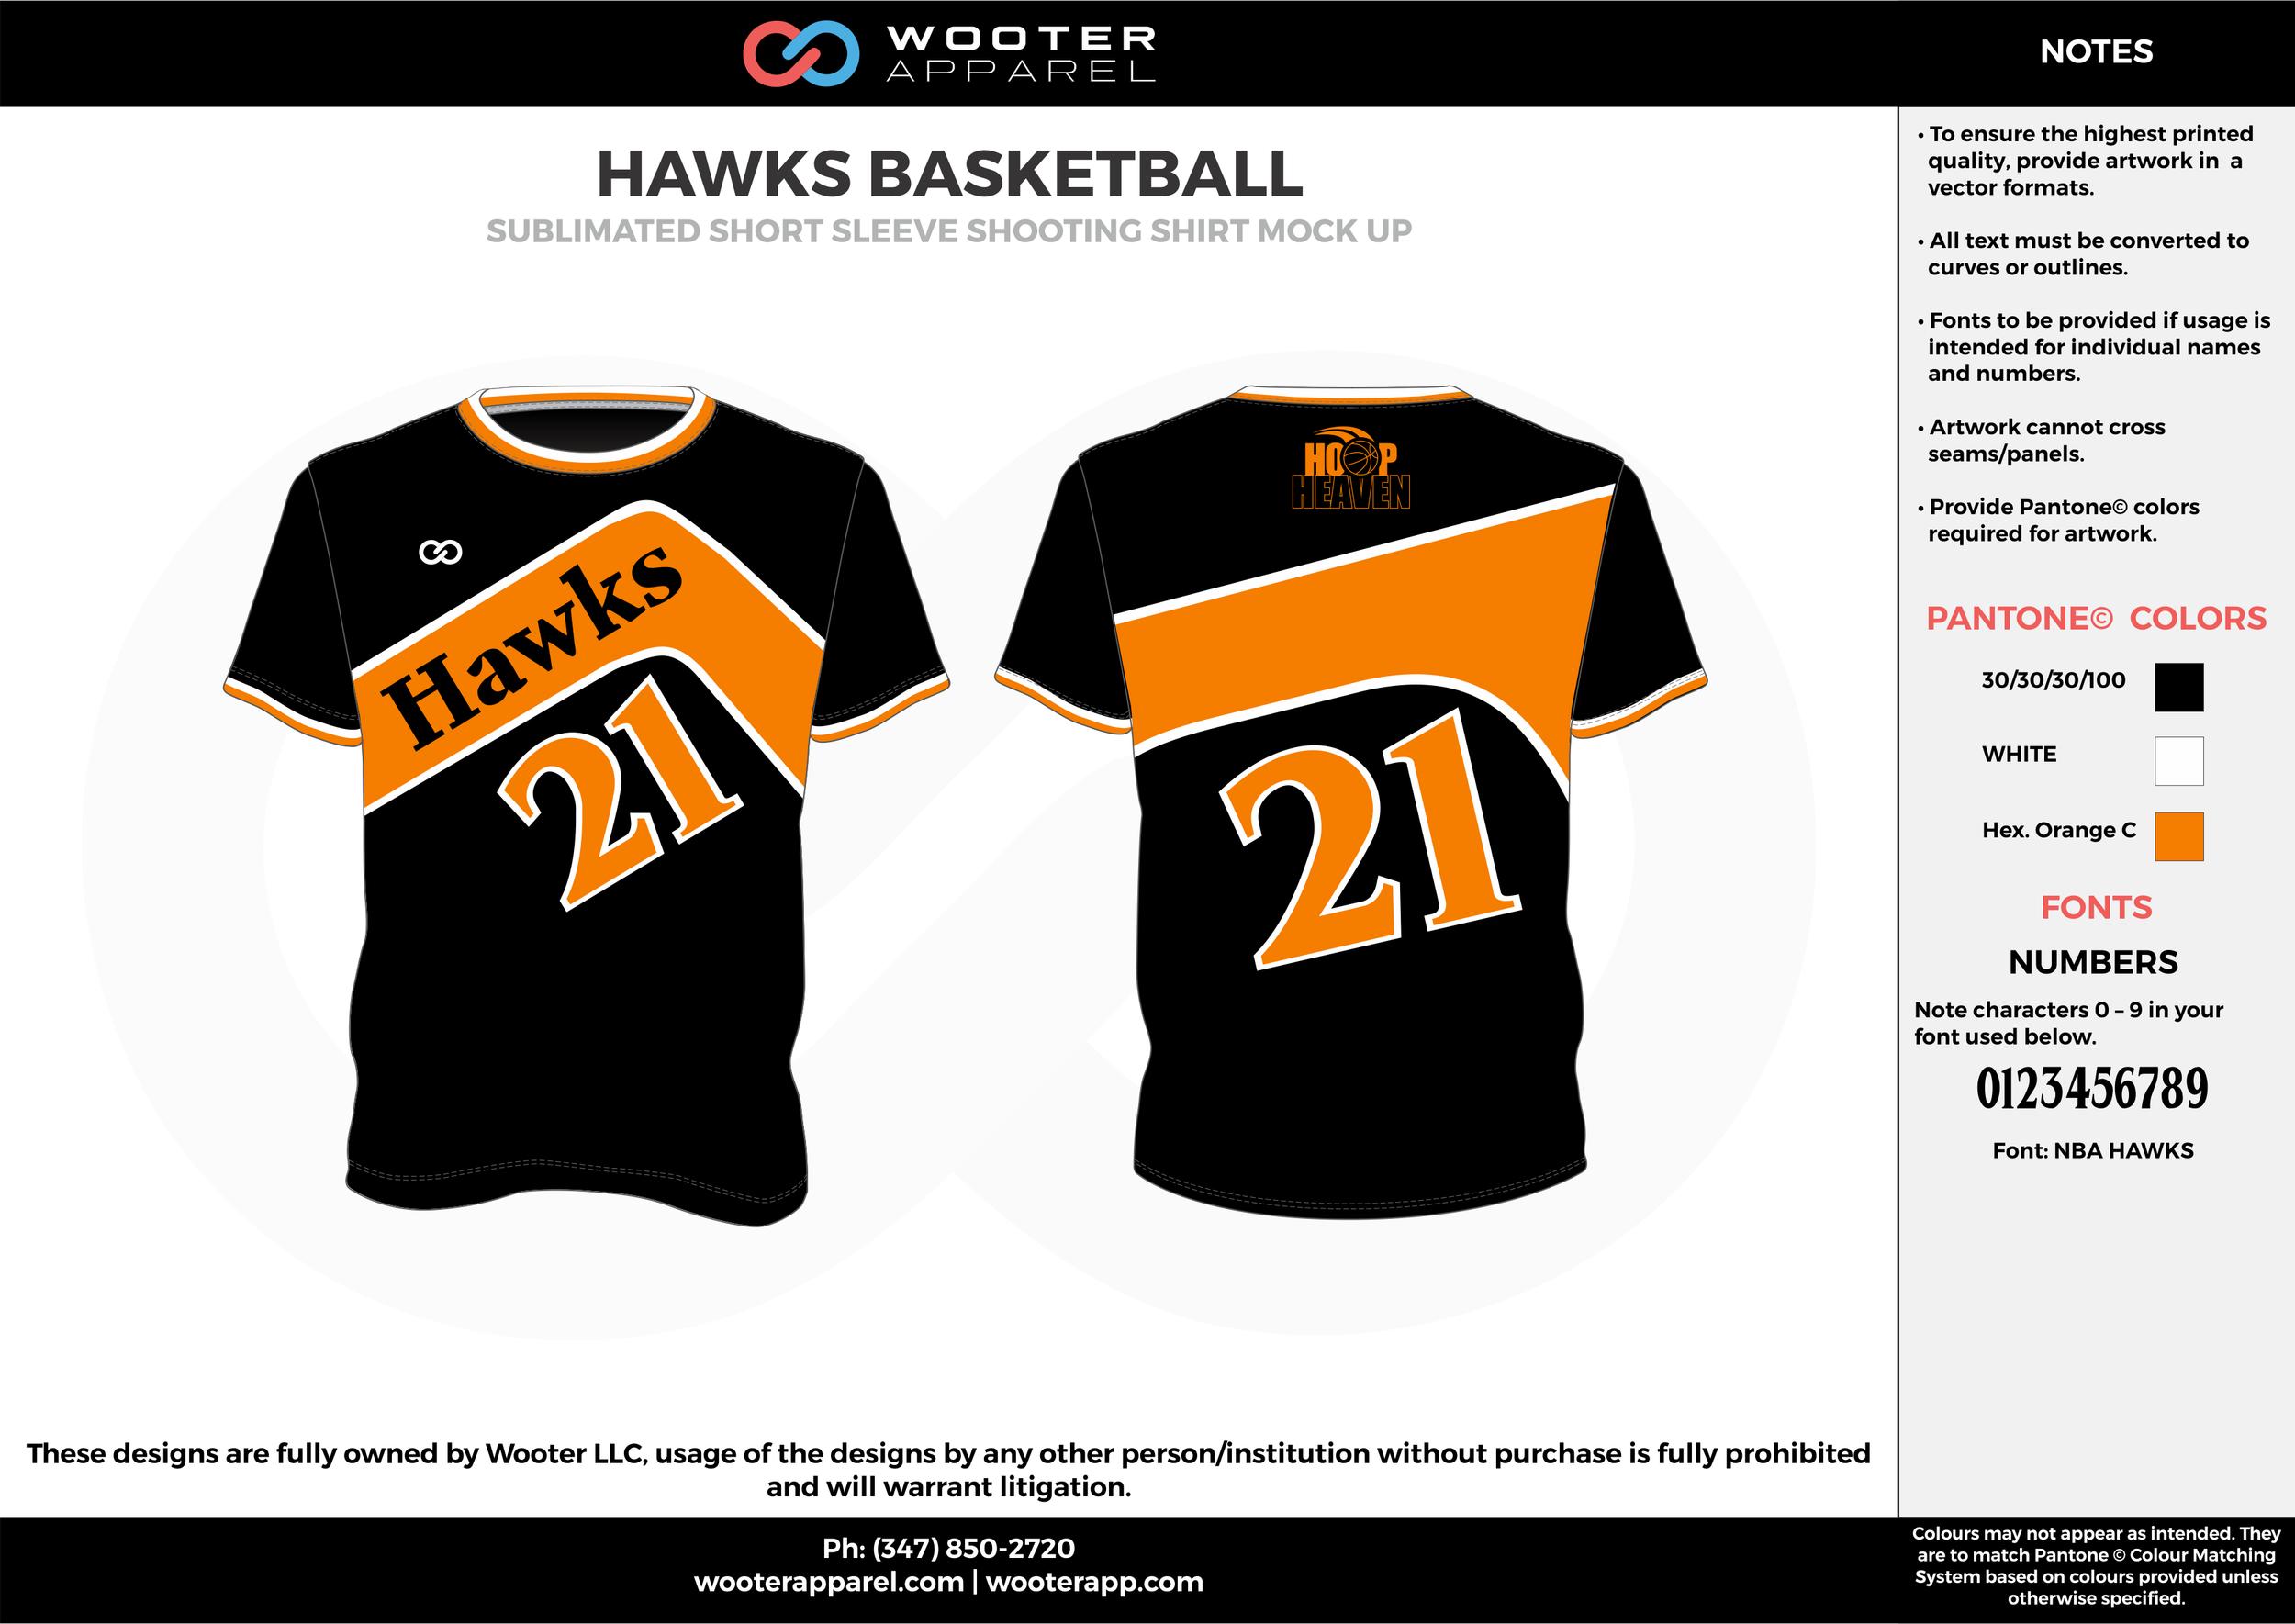 HAWKS BASKETBALL black orange white Basketball Short Sleeve Shooting Shirt